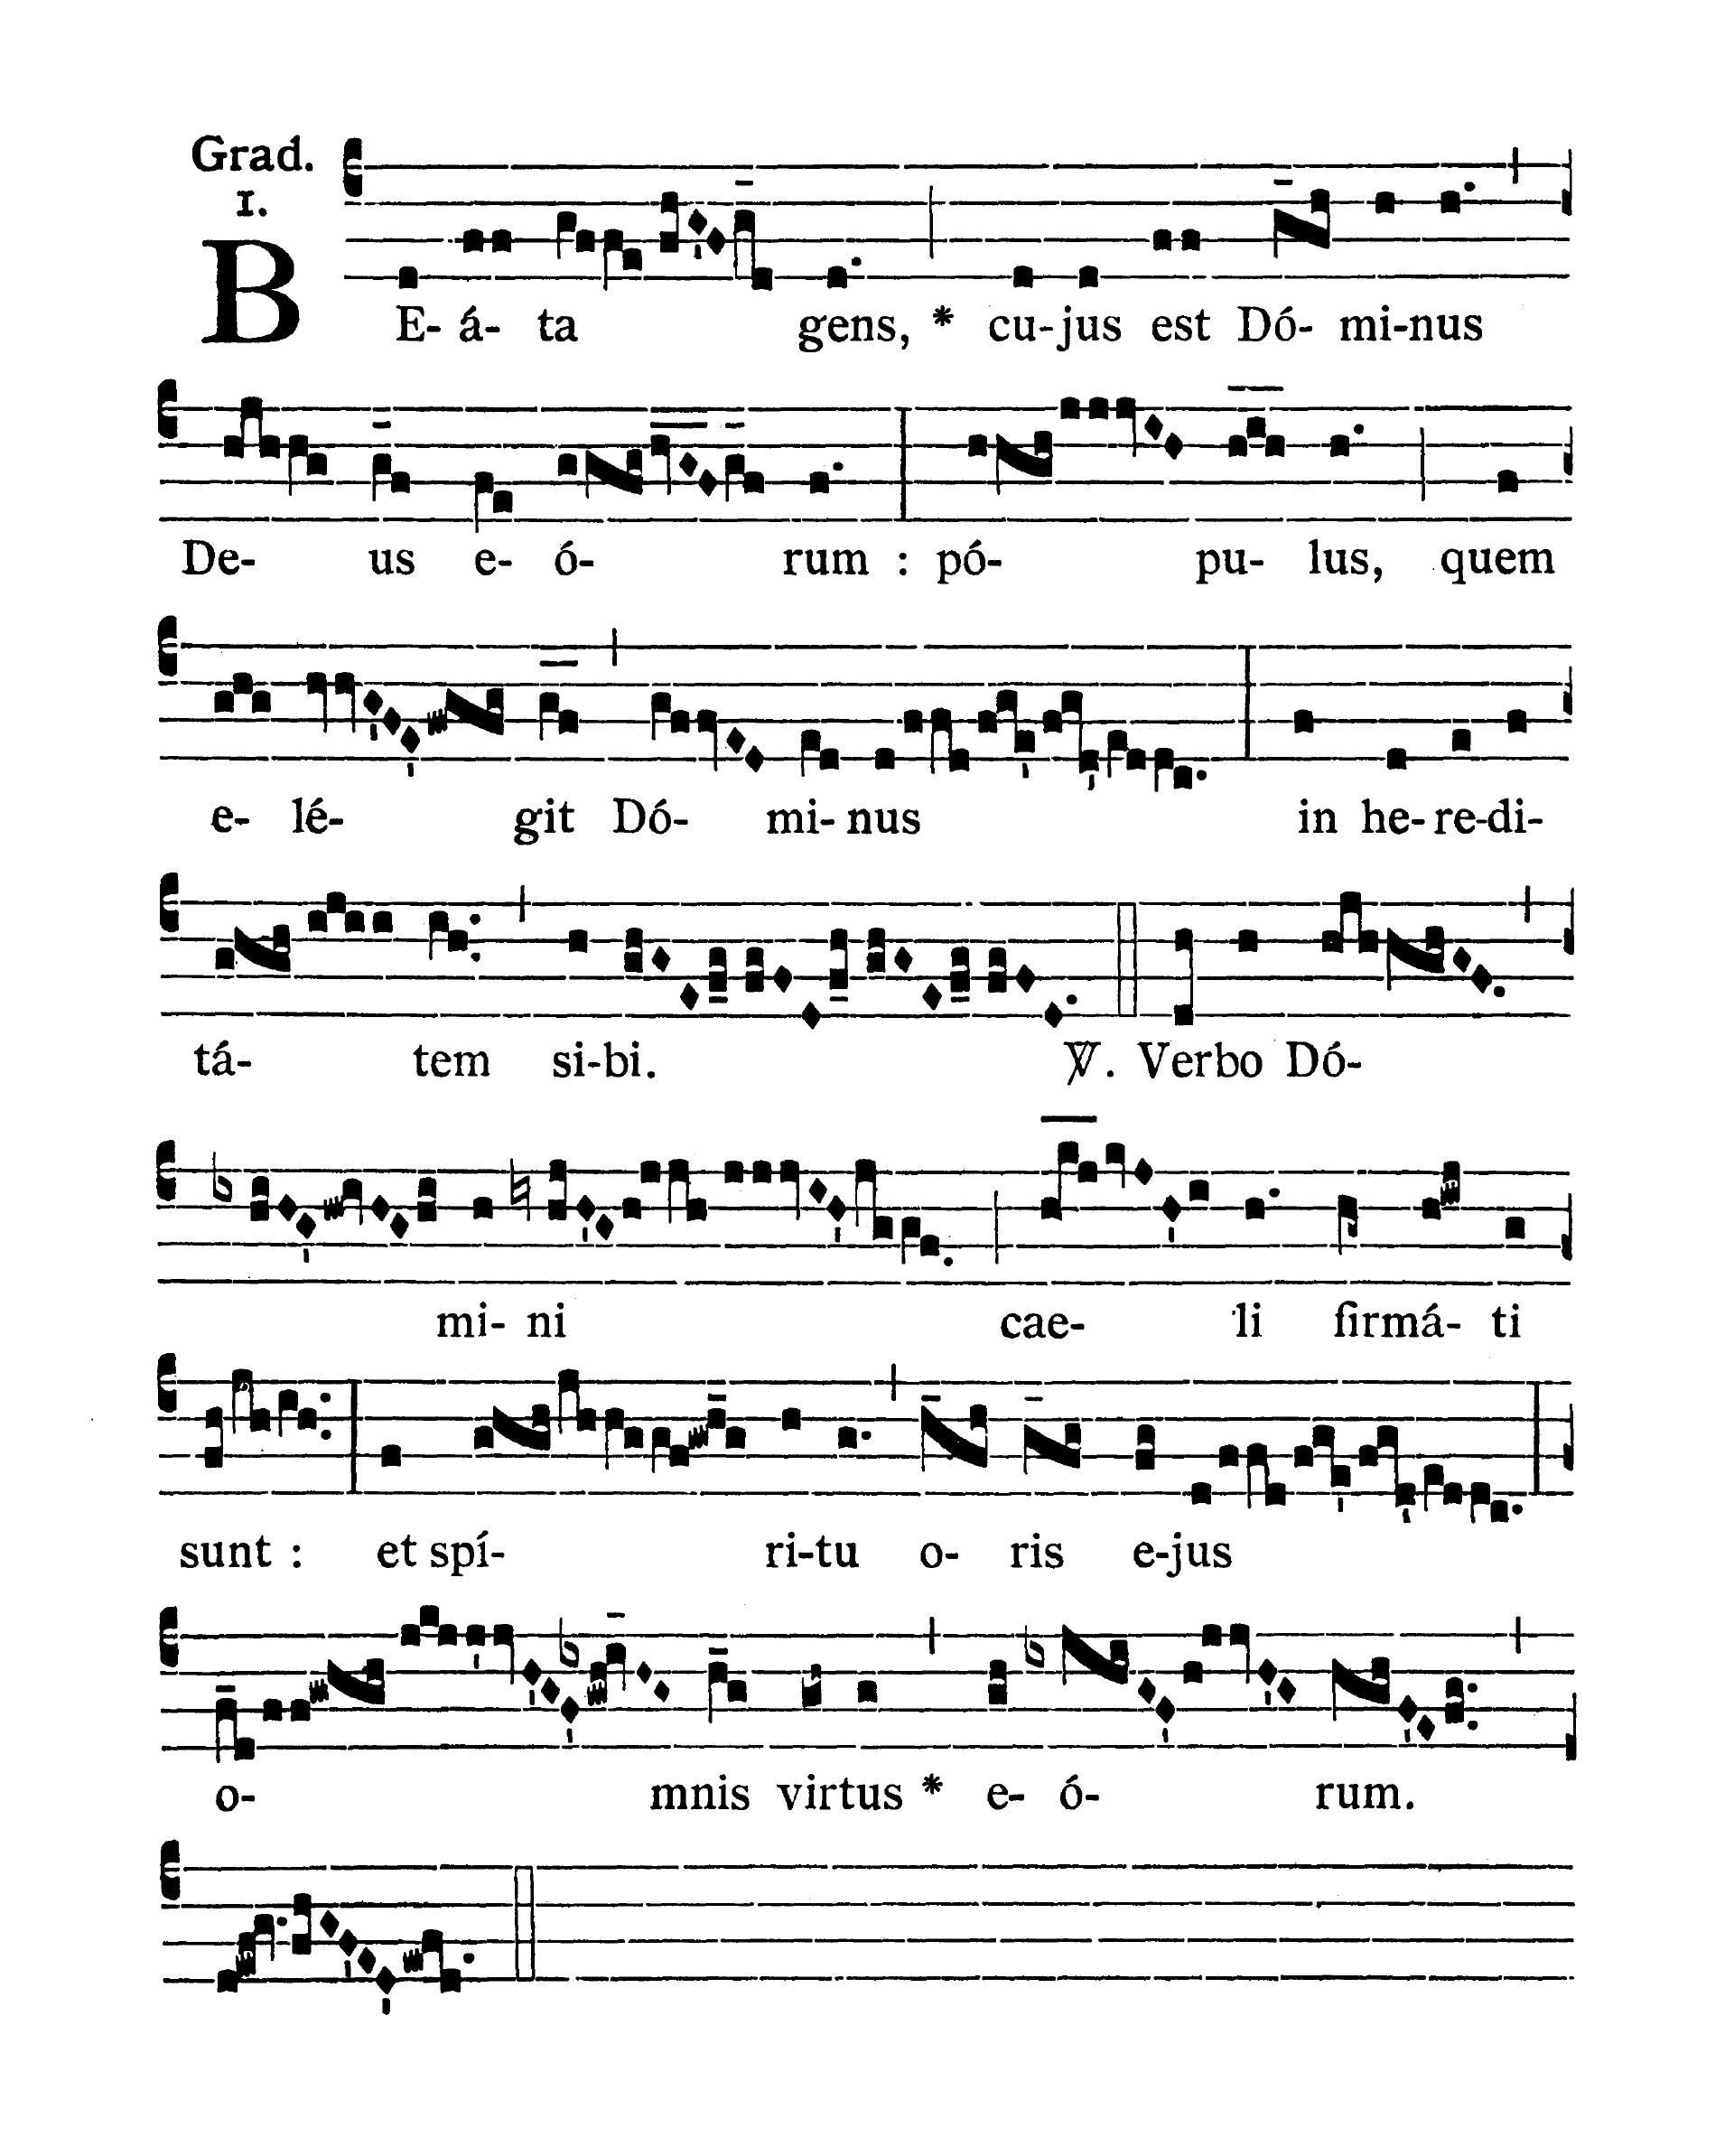 Feria IV Quatuor Temporum Septembris (Środa suchych dni wrześniowych) - Graduale (Beata gens)